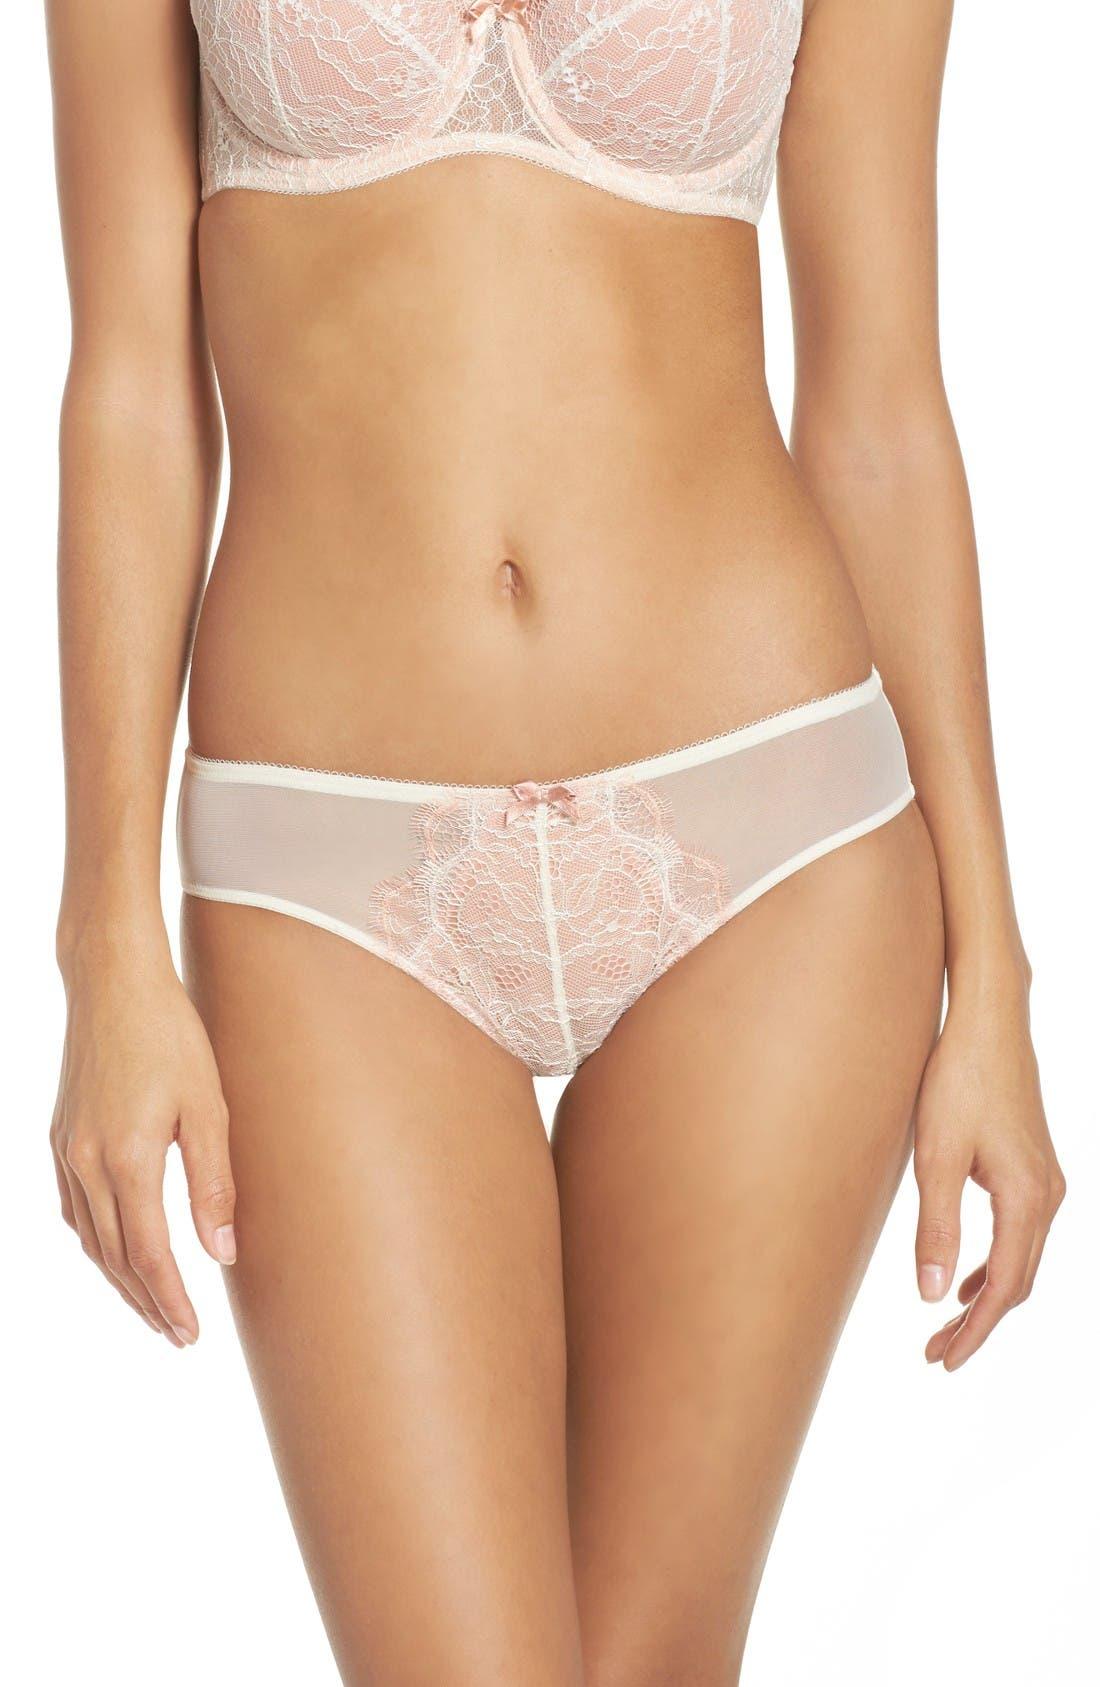 'B Sultry' Bikini,                             Main thumbnail 1, color,                             Vanilla Ice/ Peach Beige